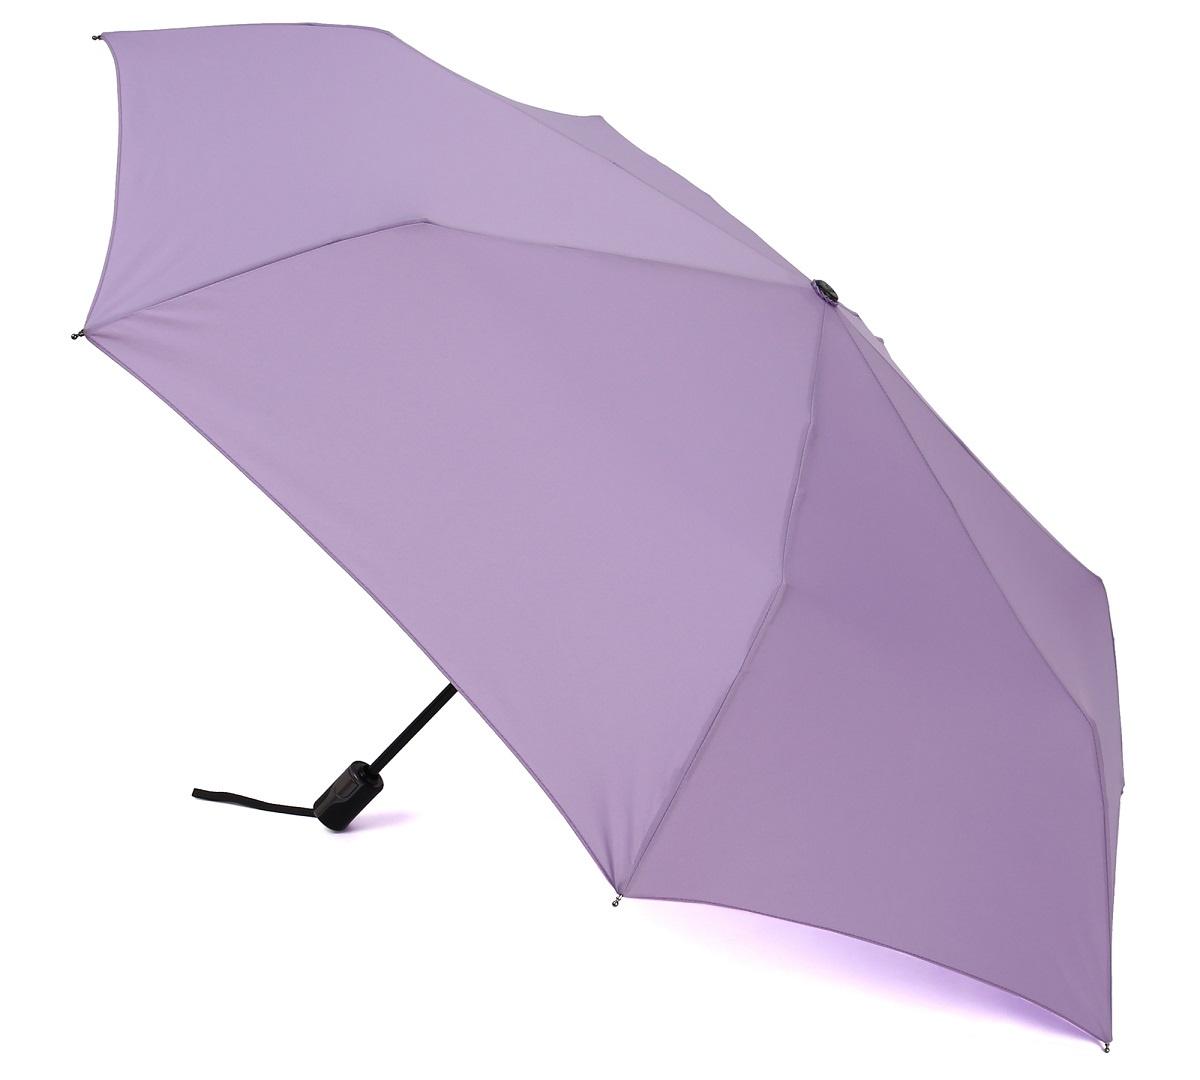 Зонт Три слона 365-D, сиреневый